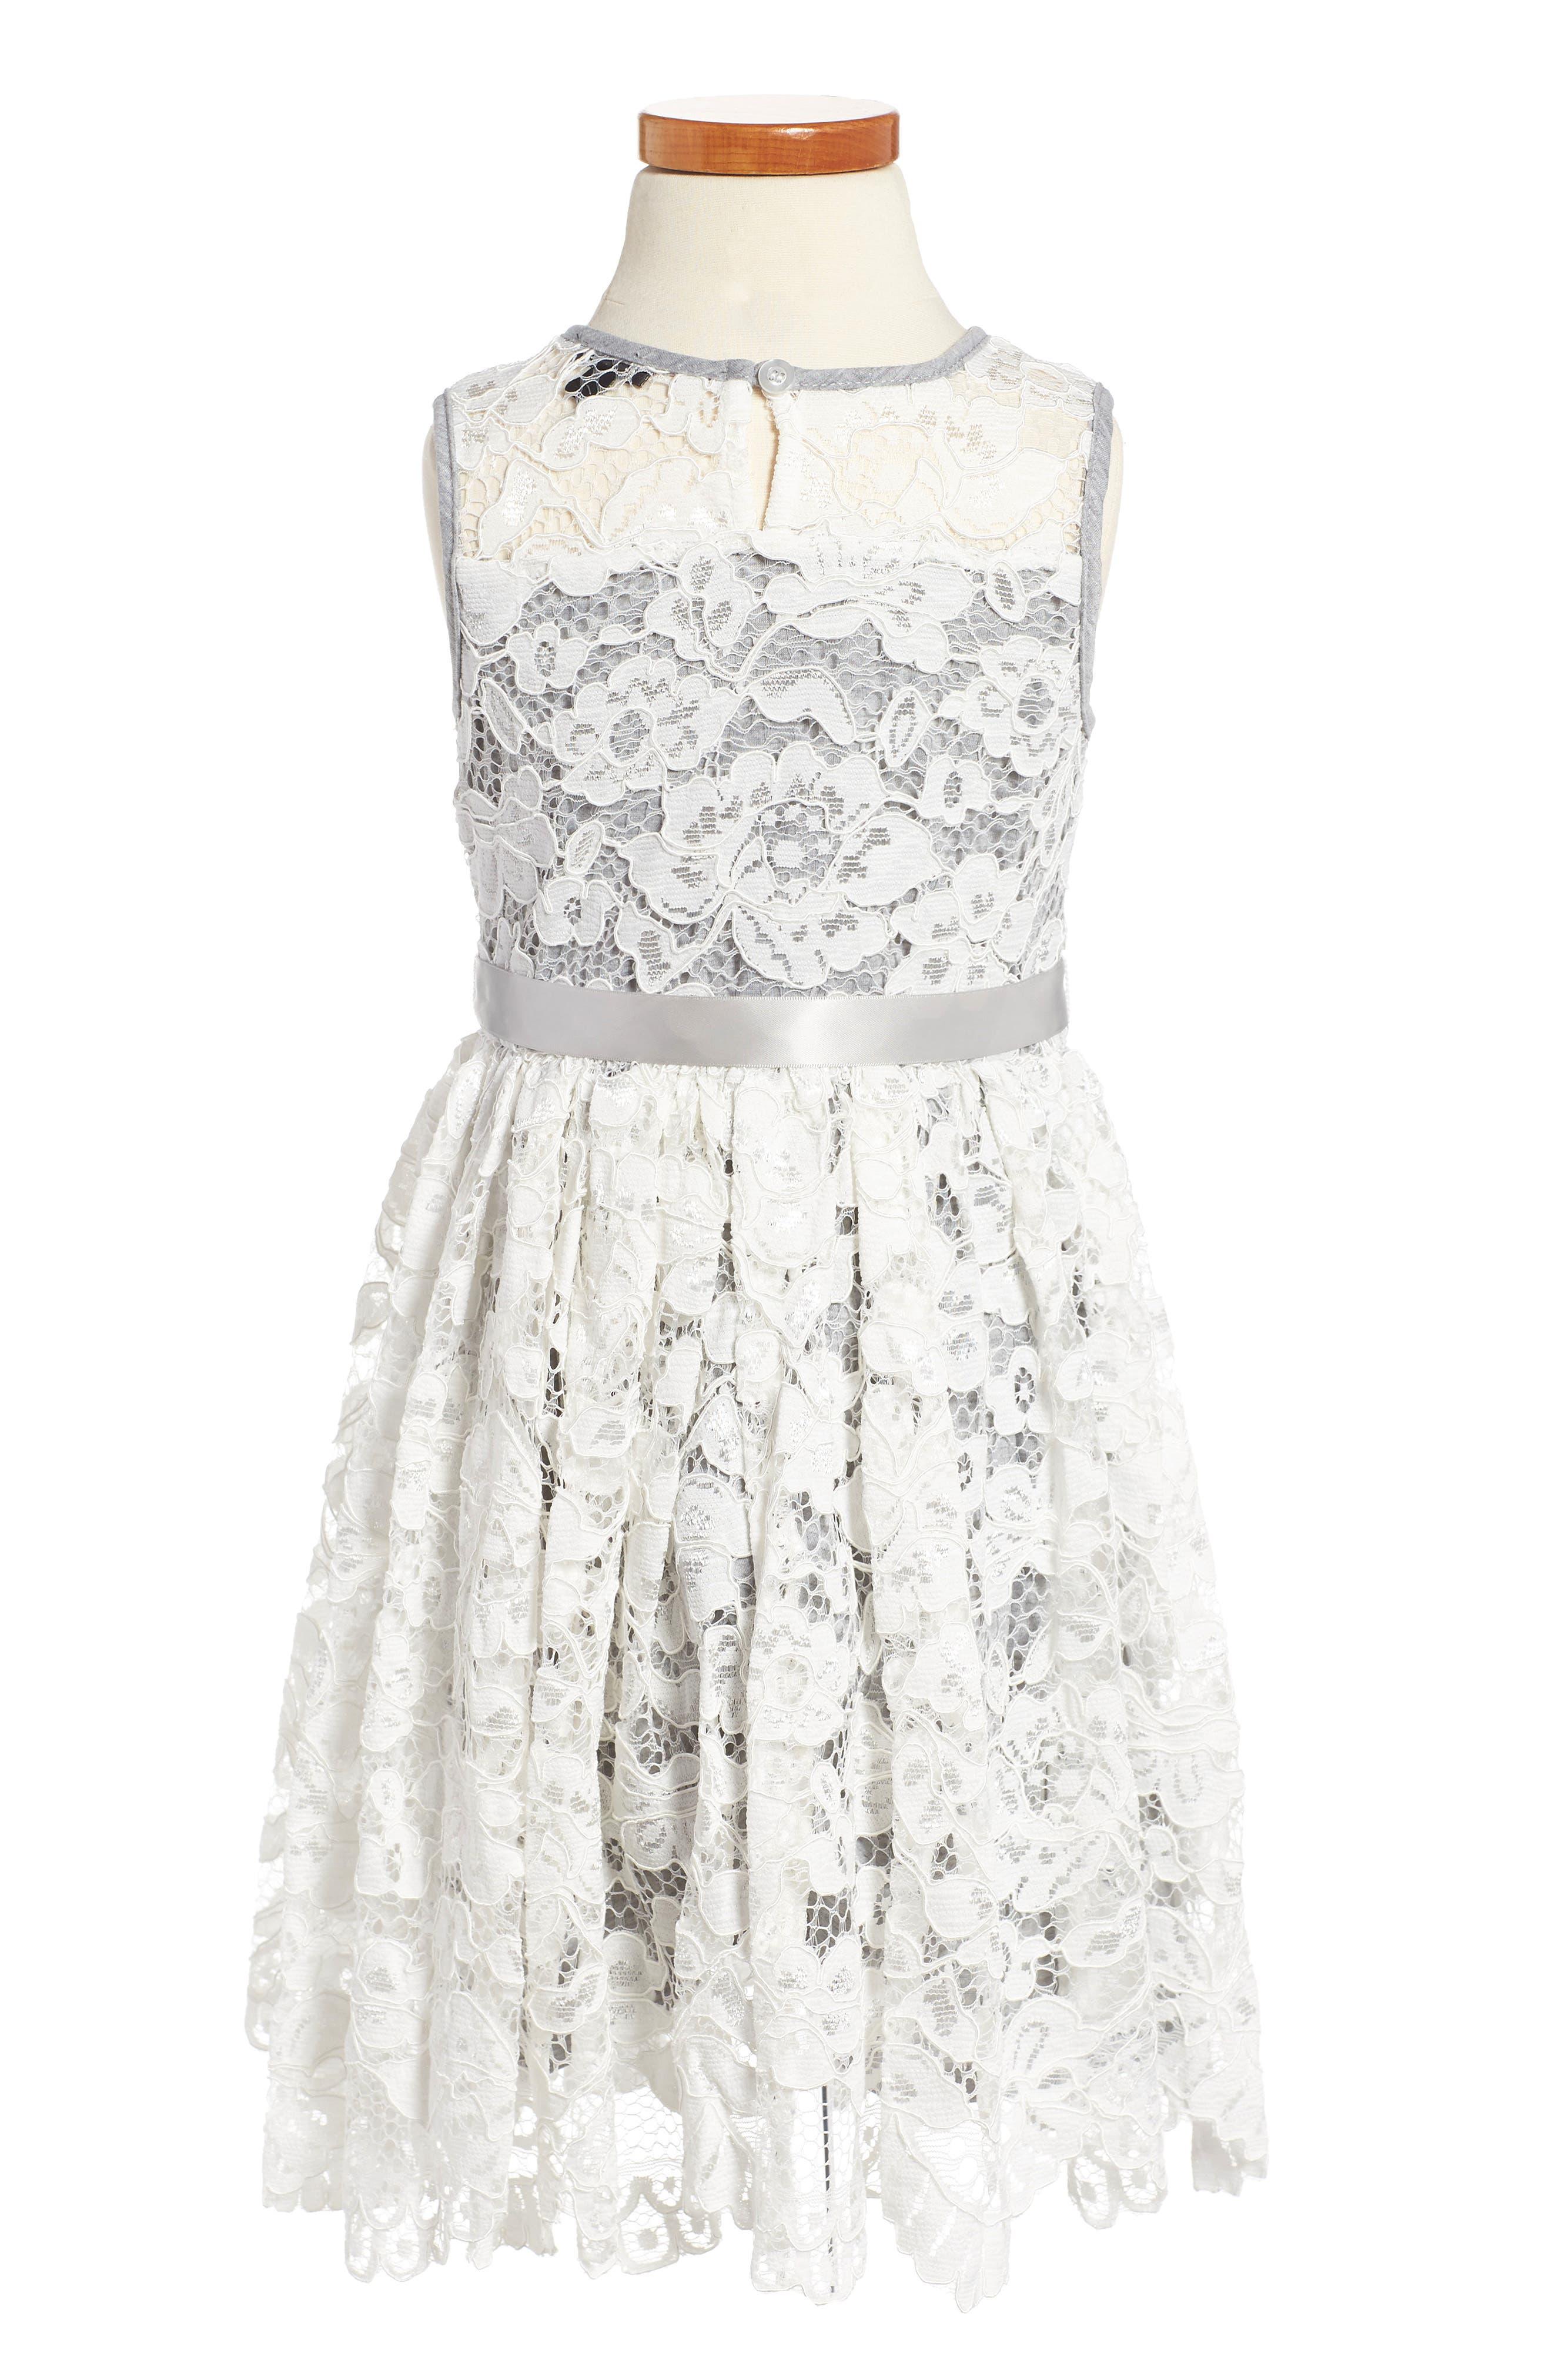 Scalloped Floral Lace Dress,                             Main thumbnail 1, color,                             904